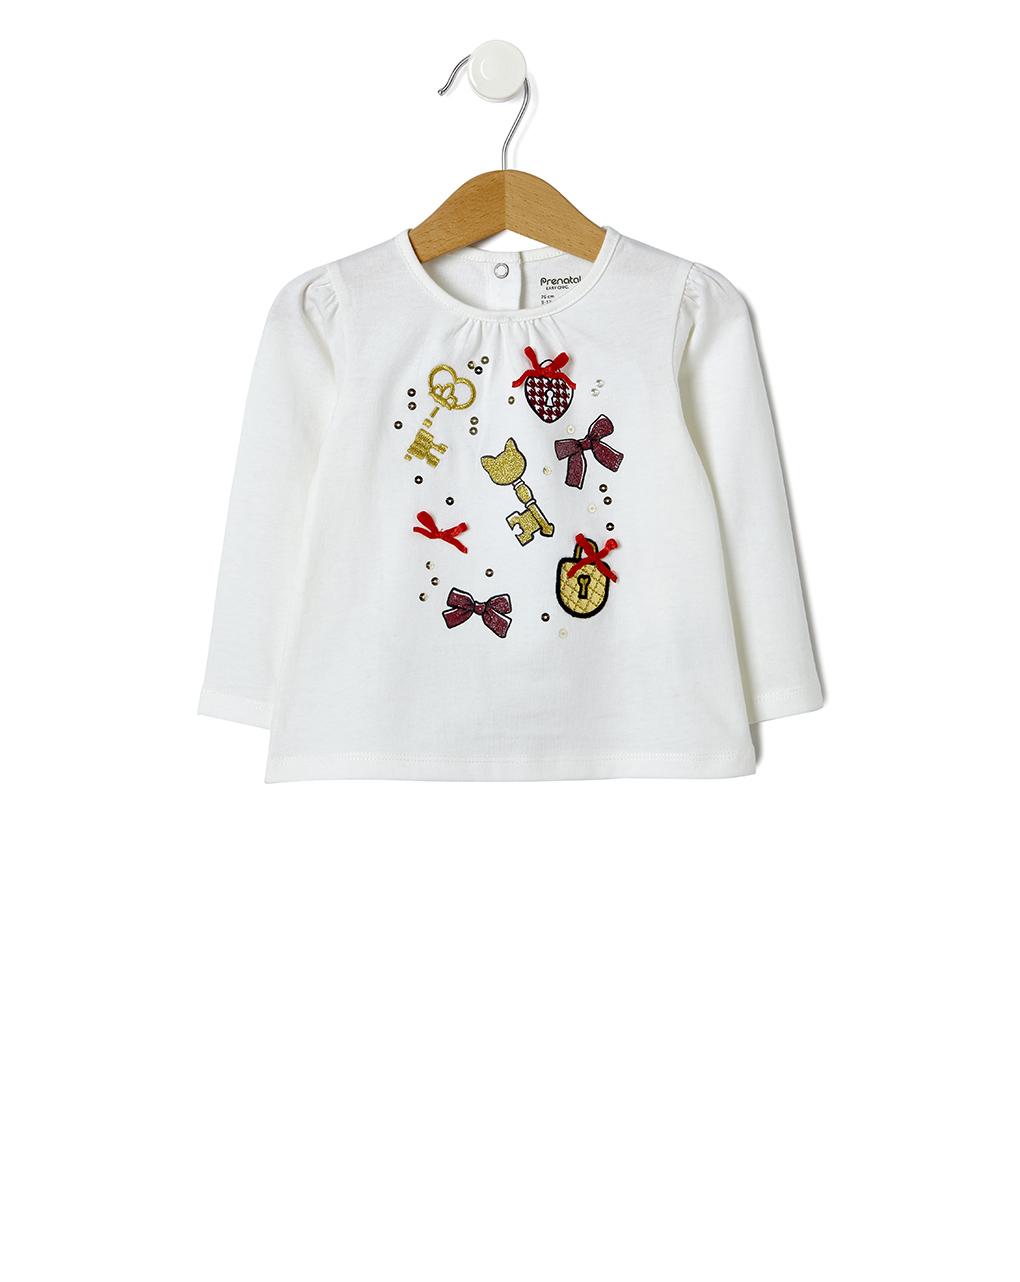 T-shirt panna con applicazioni chiavi - Prénatal